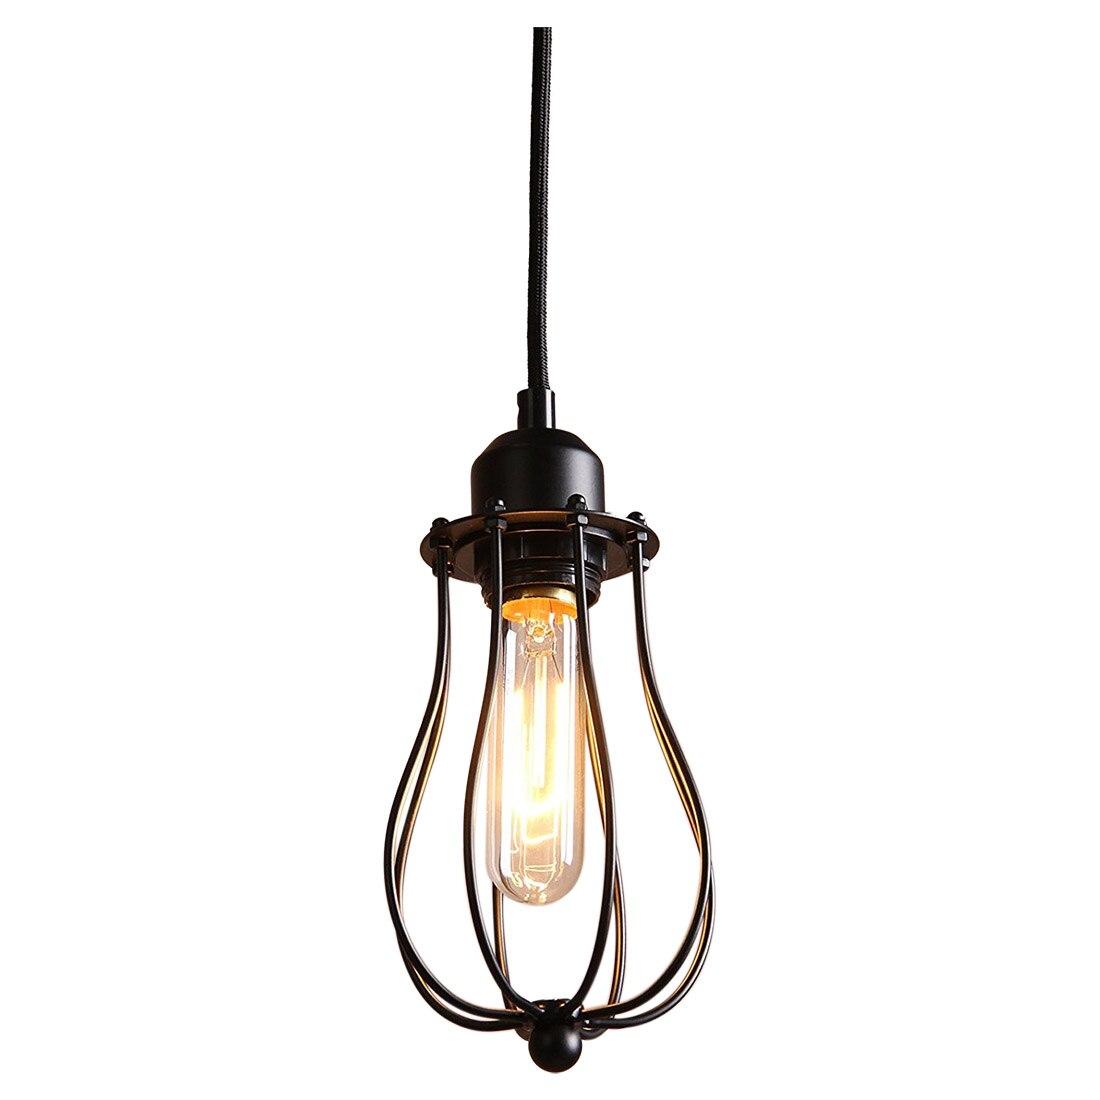 Vintage Retro Industrial Edison Metal Shade Ceiling Pendant Lamp Fixture Black